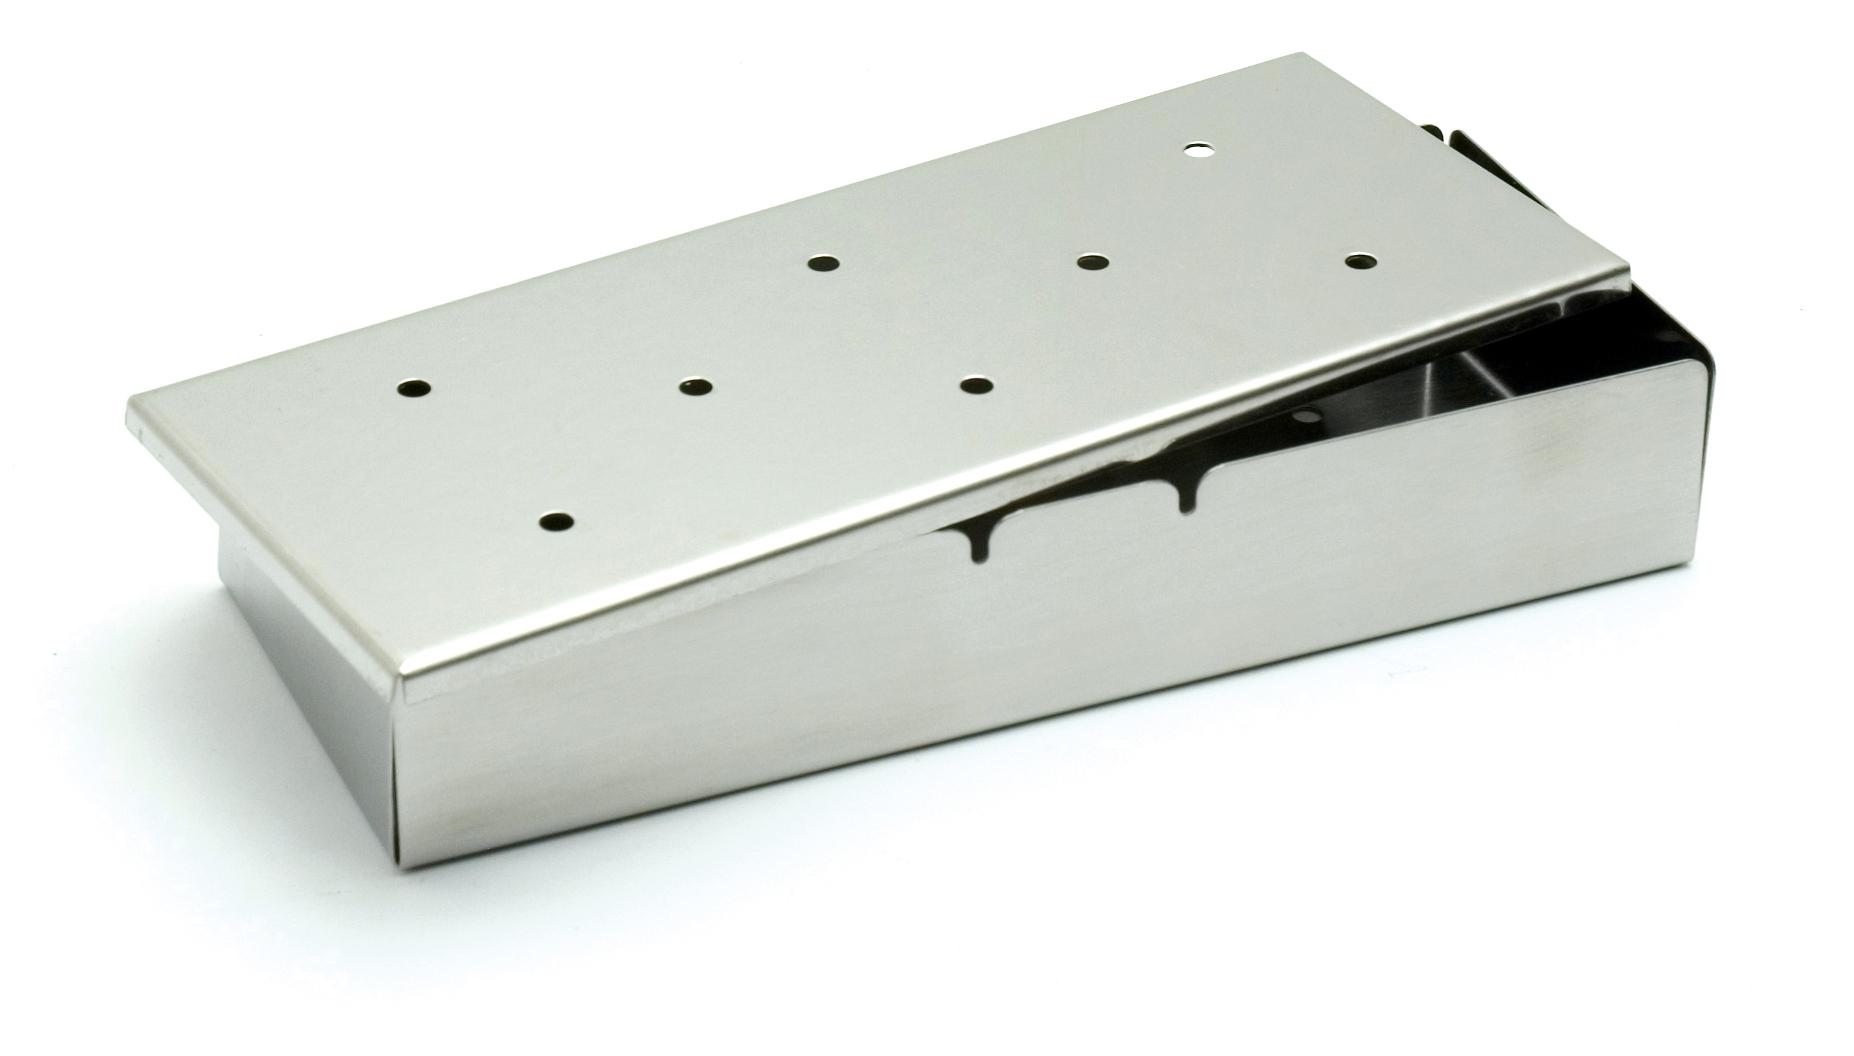 grill r ucherbox mit deckel in edelstahl grill shop. Black Bedroom Furniture Sets. Home Design Ideas